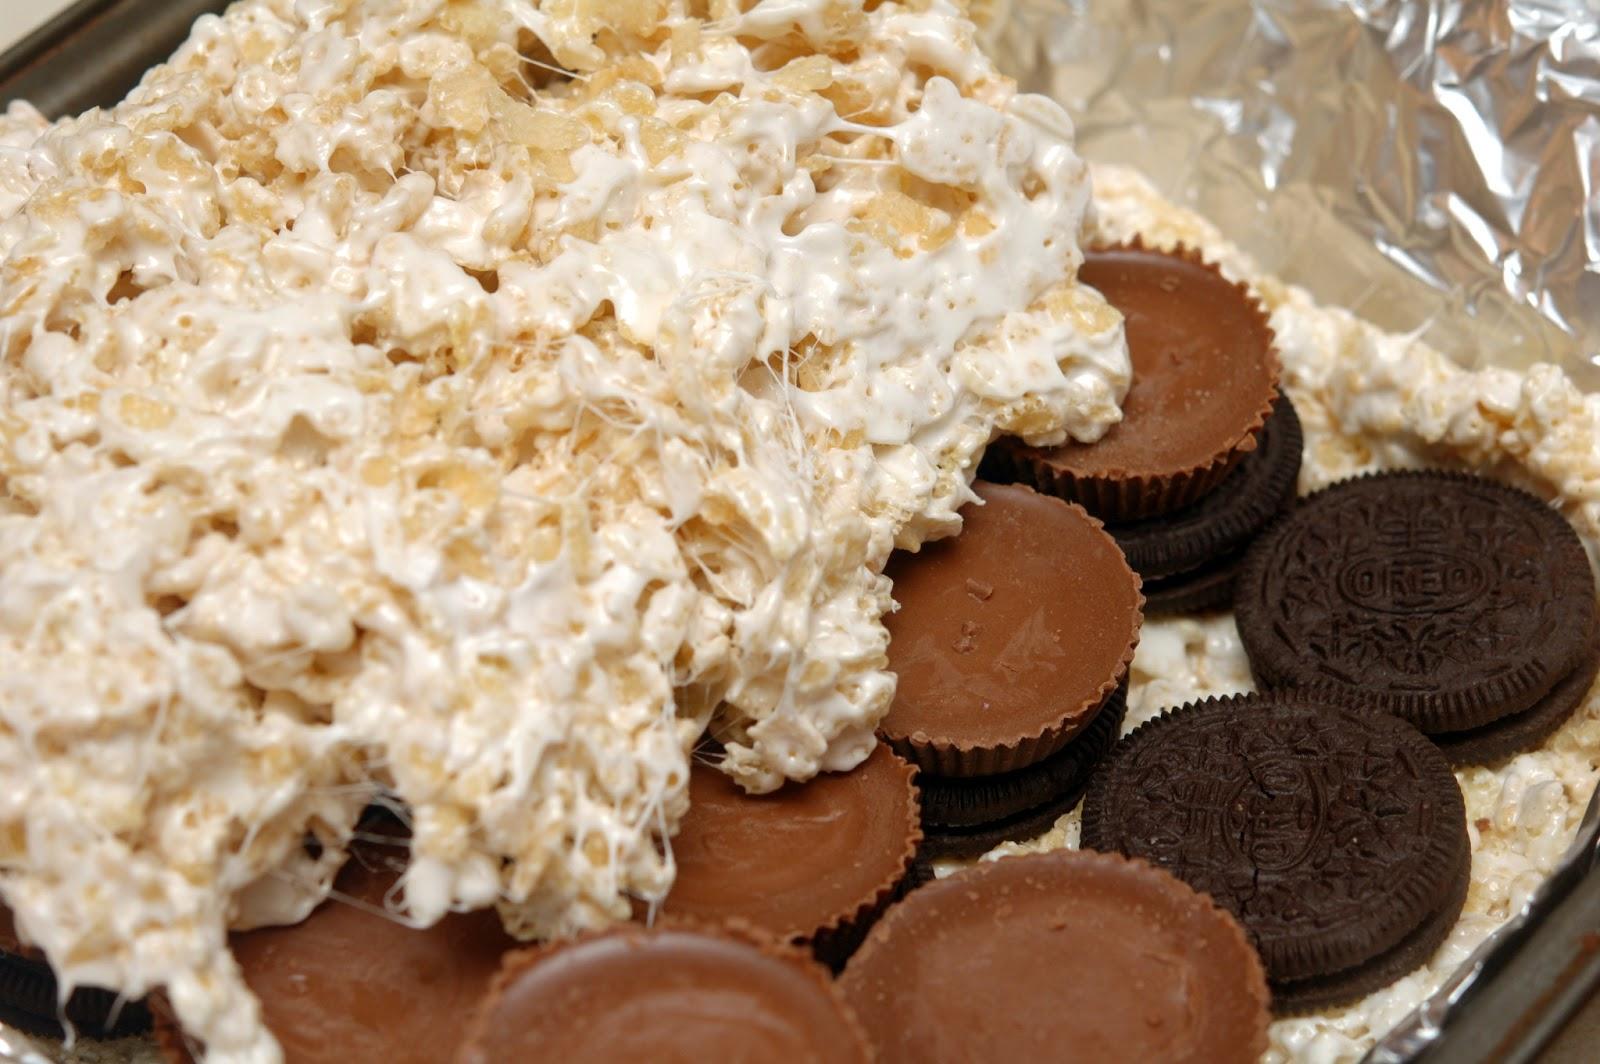 Oreo amp peanut butter cup stuffed rice krispy treats hugs and